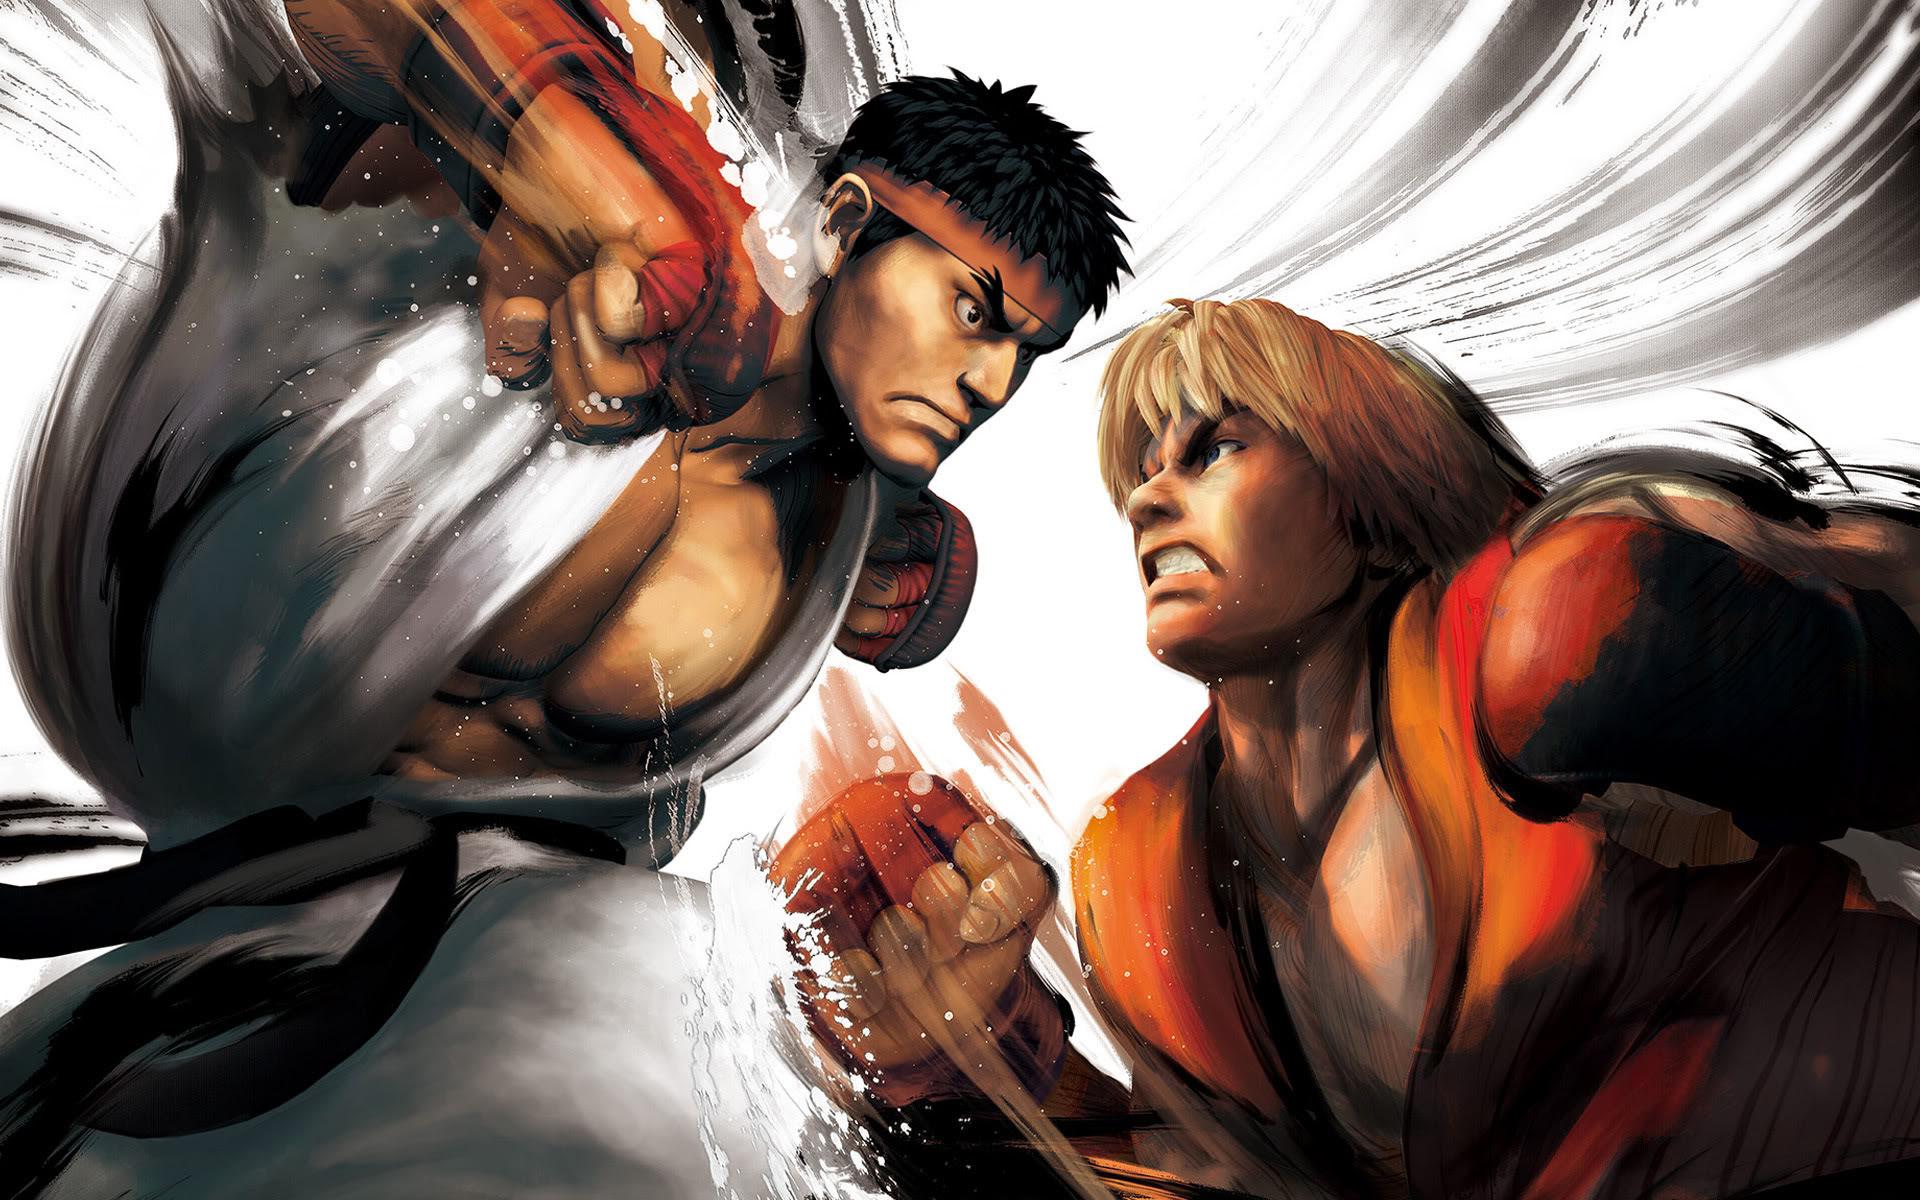 Street Fighter Hd Wallpaper 1920x1200 67916